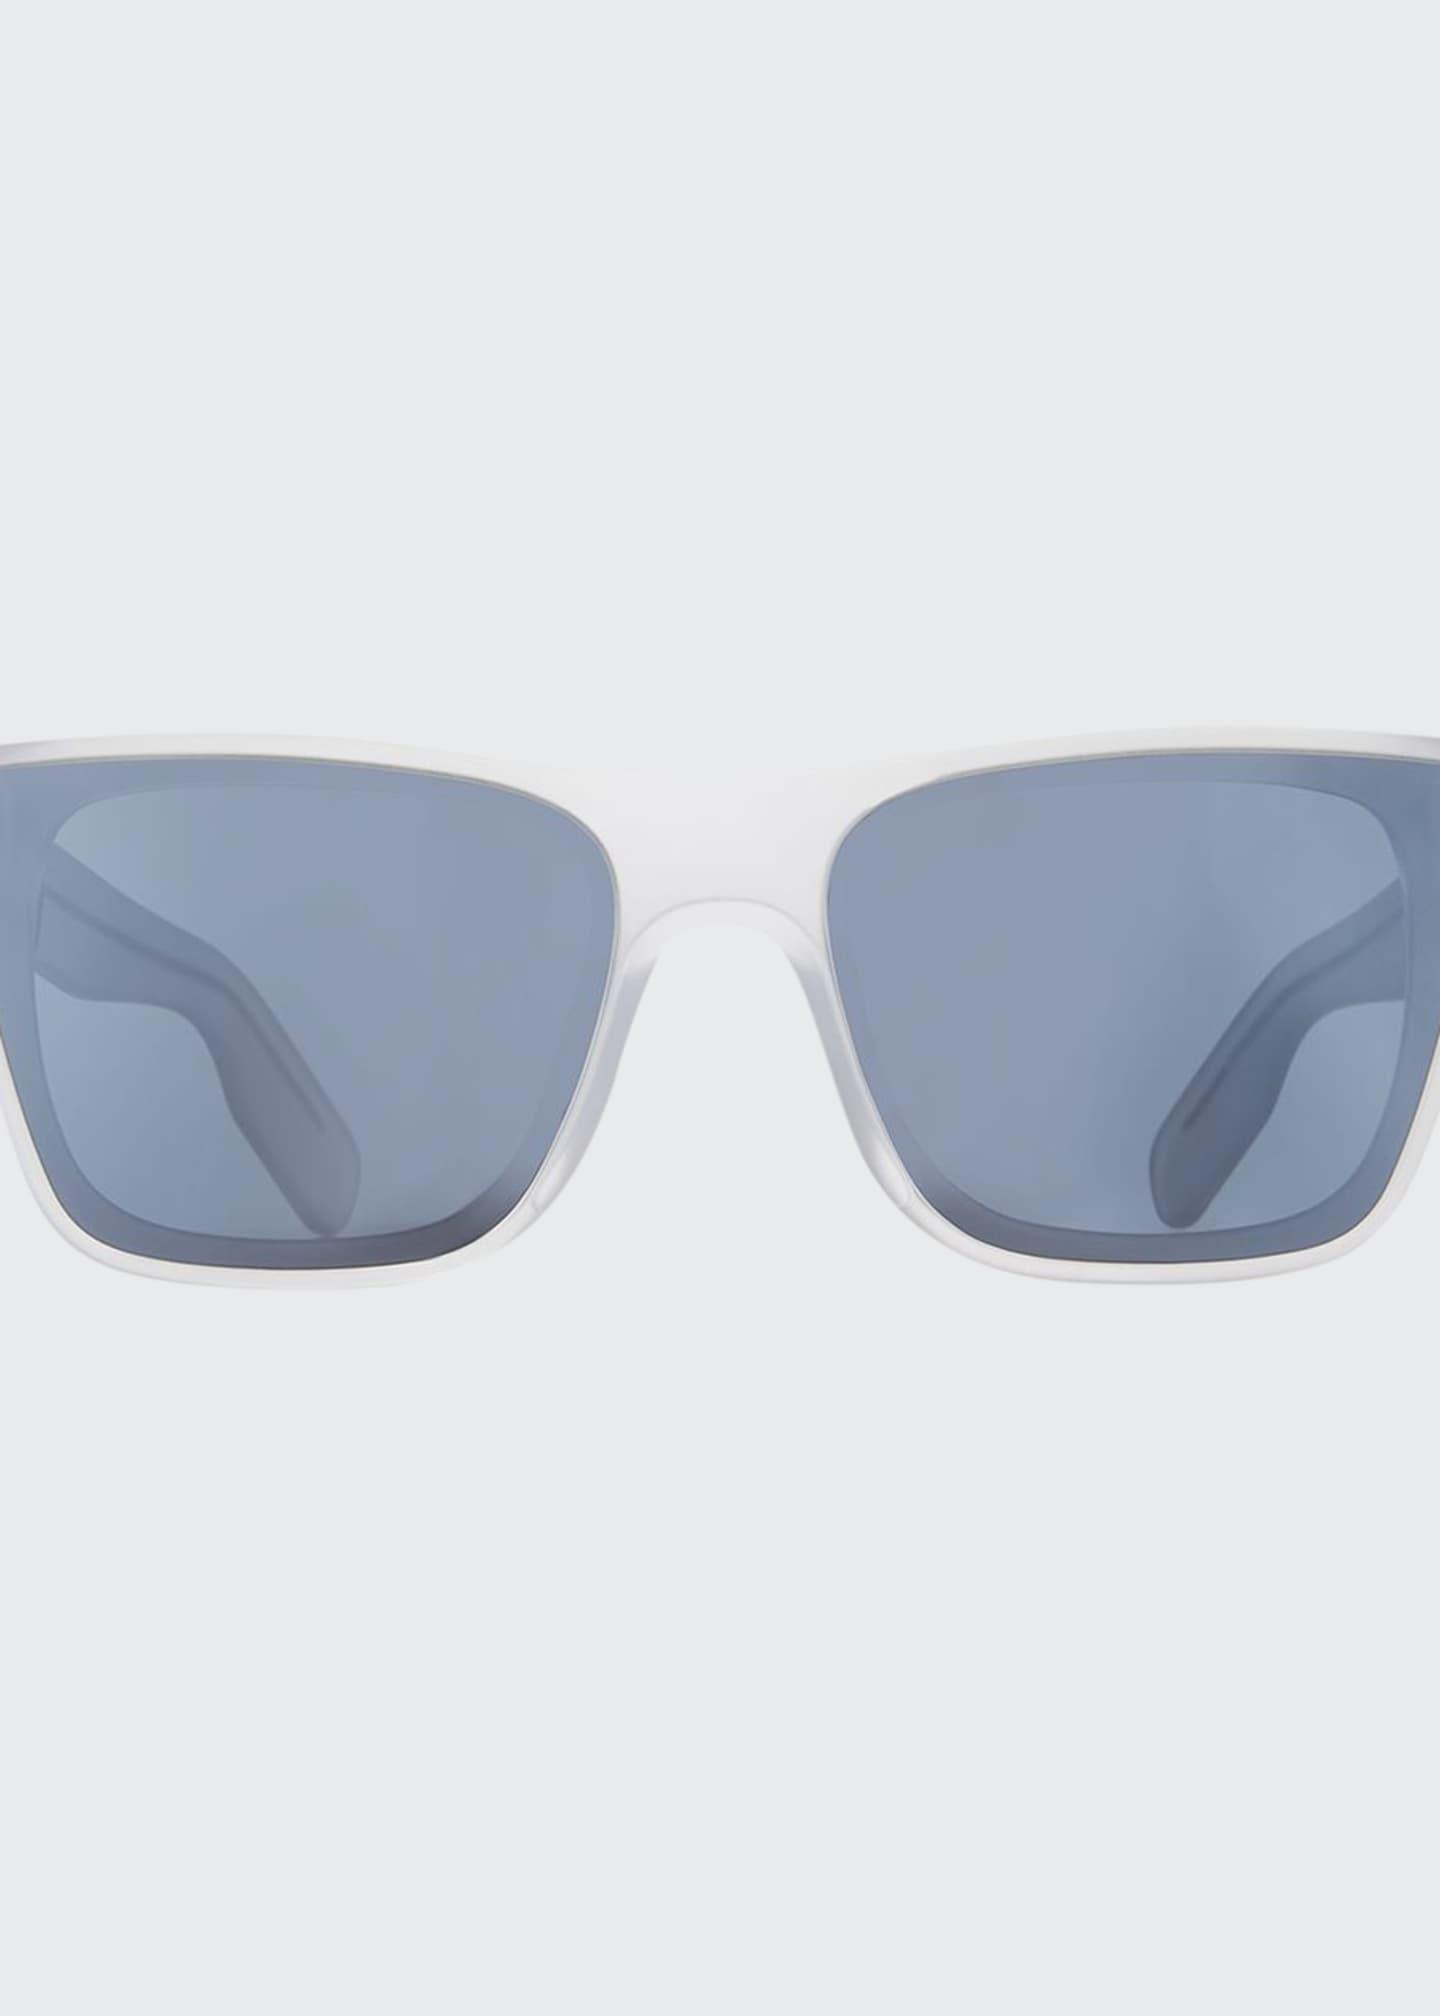 Kenzo Men's Transparent Square Sunglasses